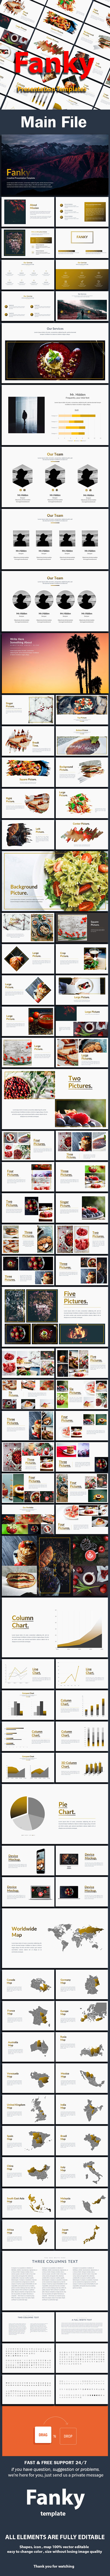 Fanky - Food Keynote Template - Keynote Templates Presentation Templates